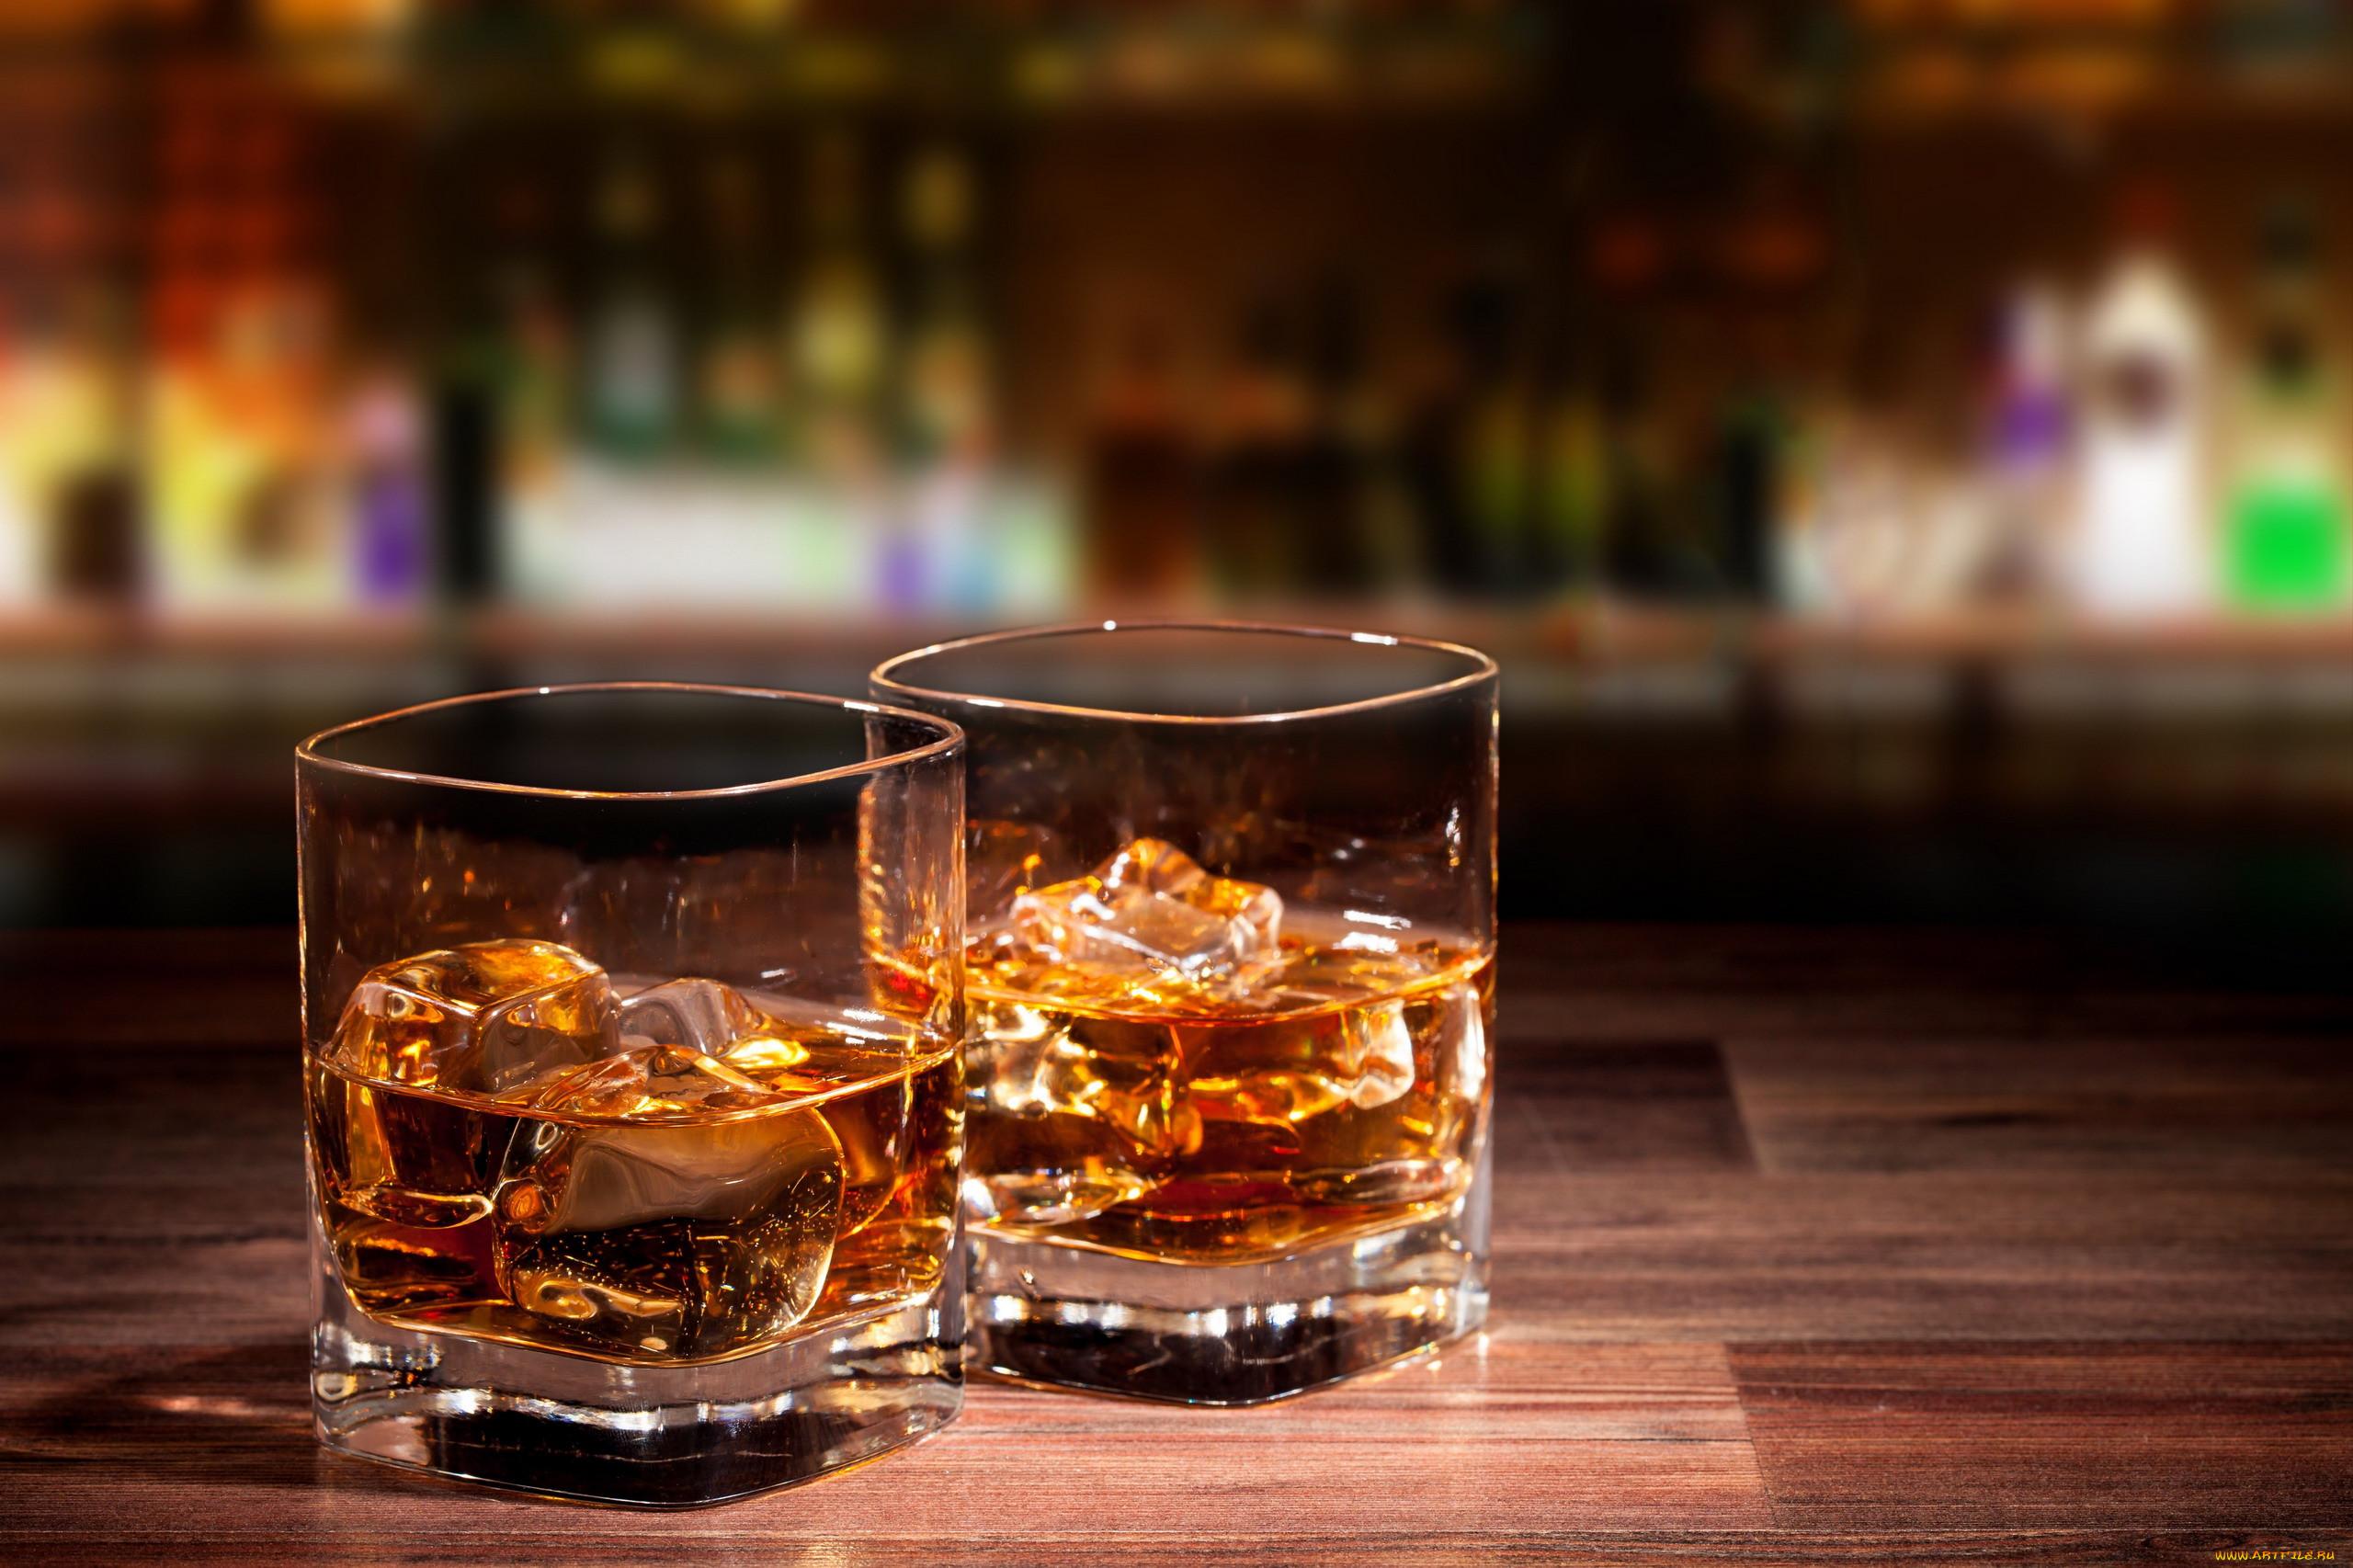 красивые картинки виски со льдом заказе